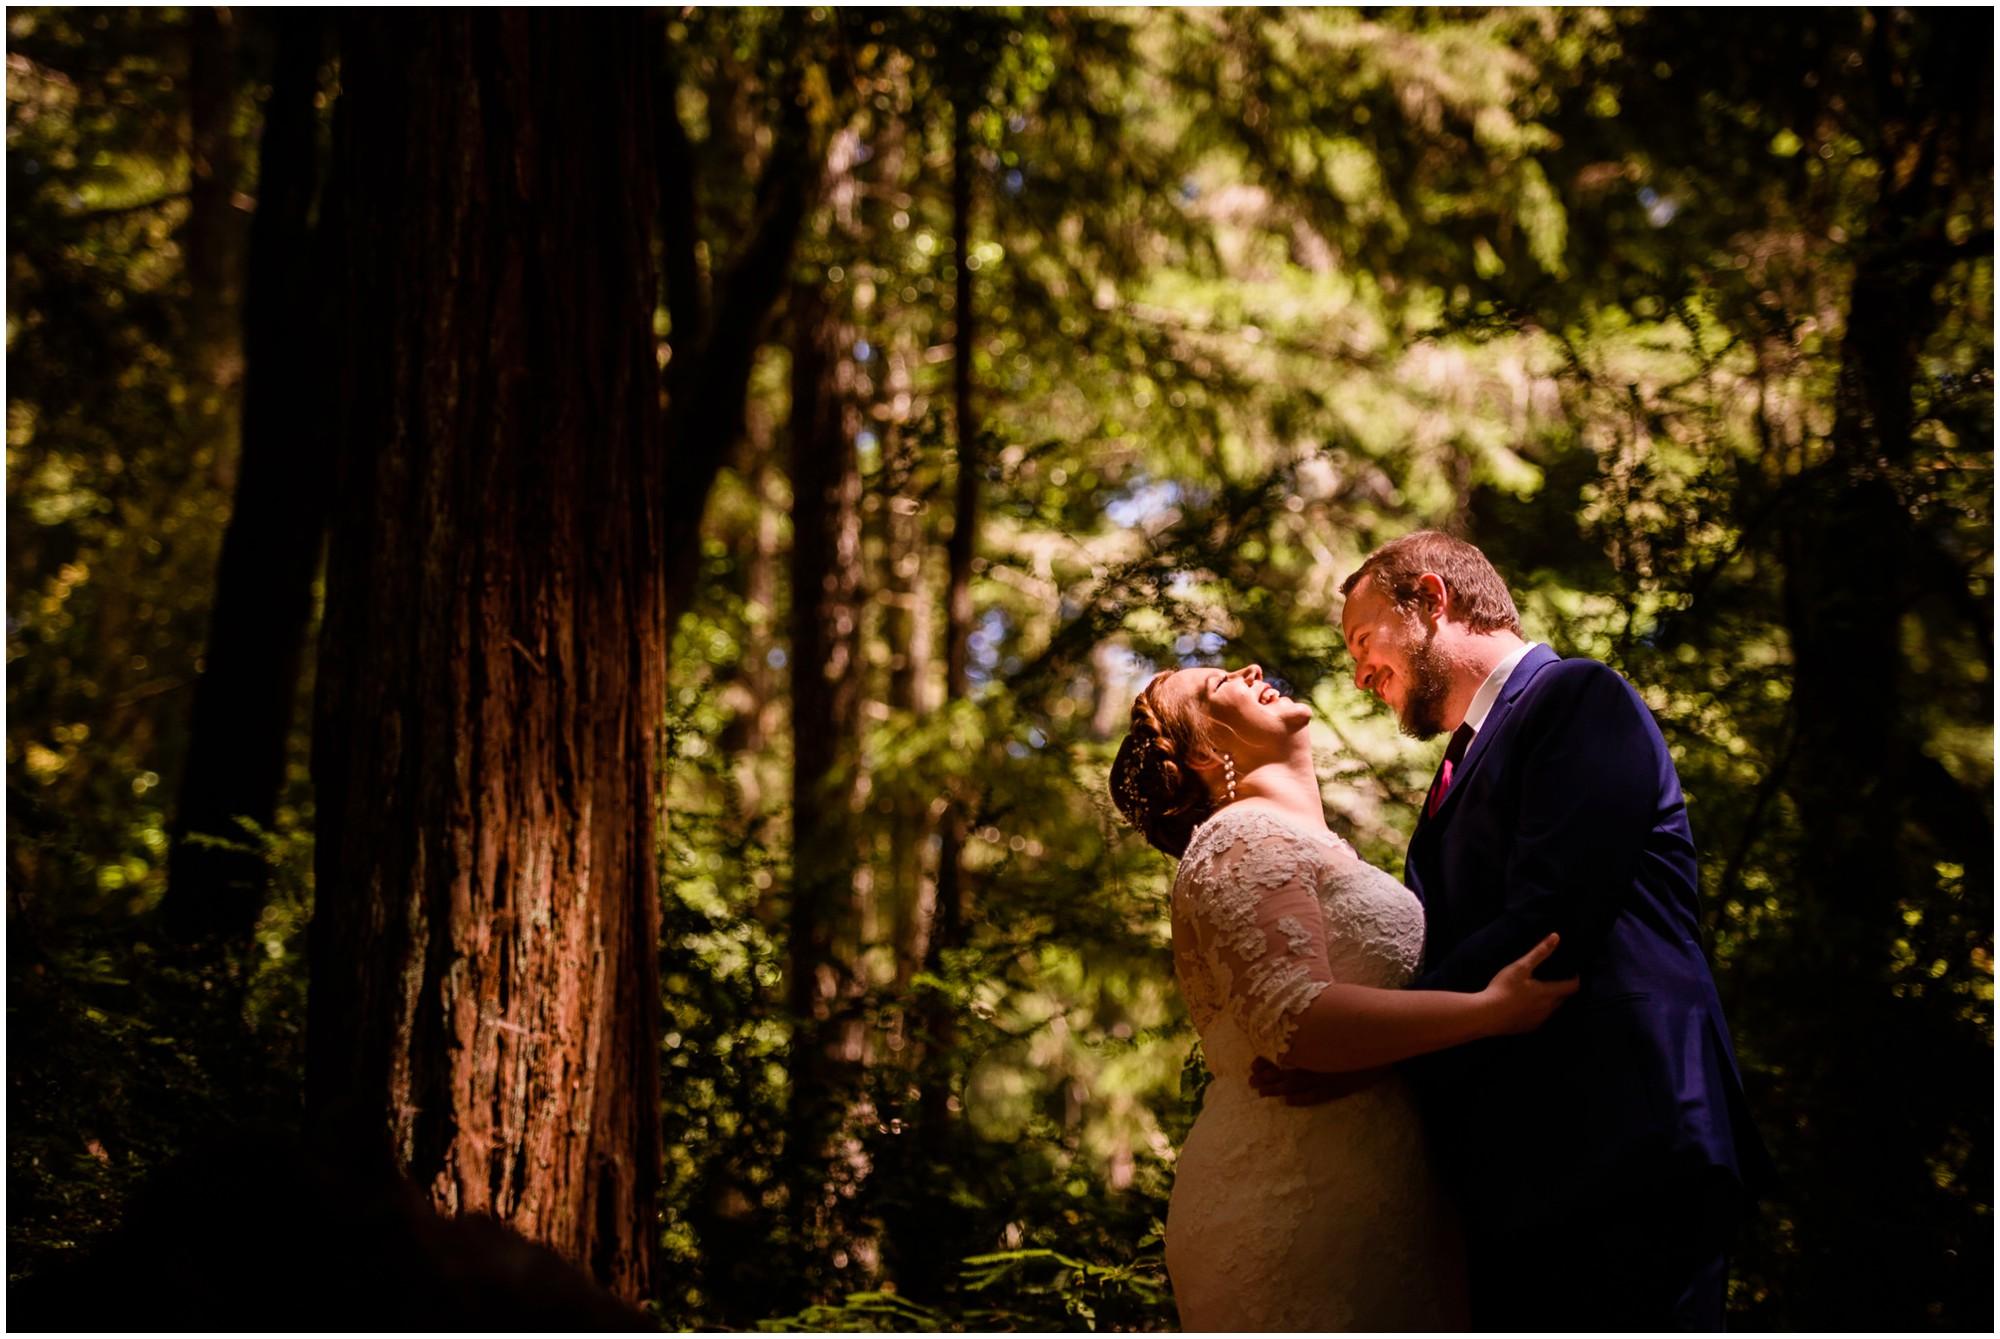 283-Redwood-Forest-California-camping-wedding.jpg